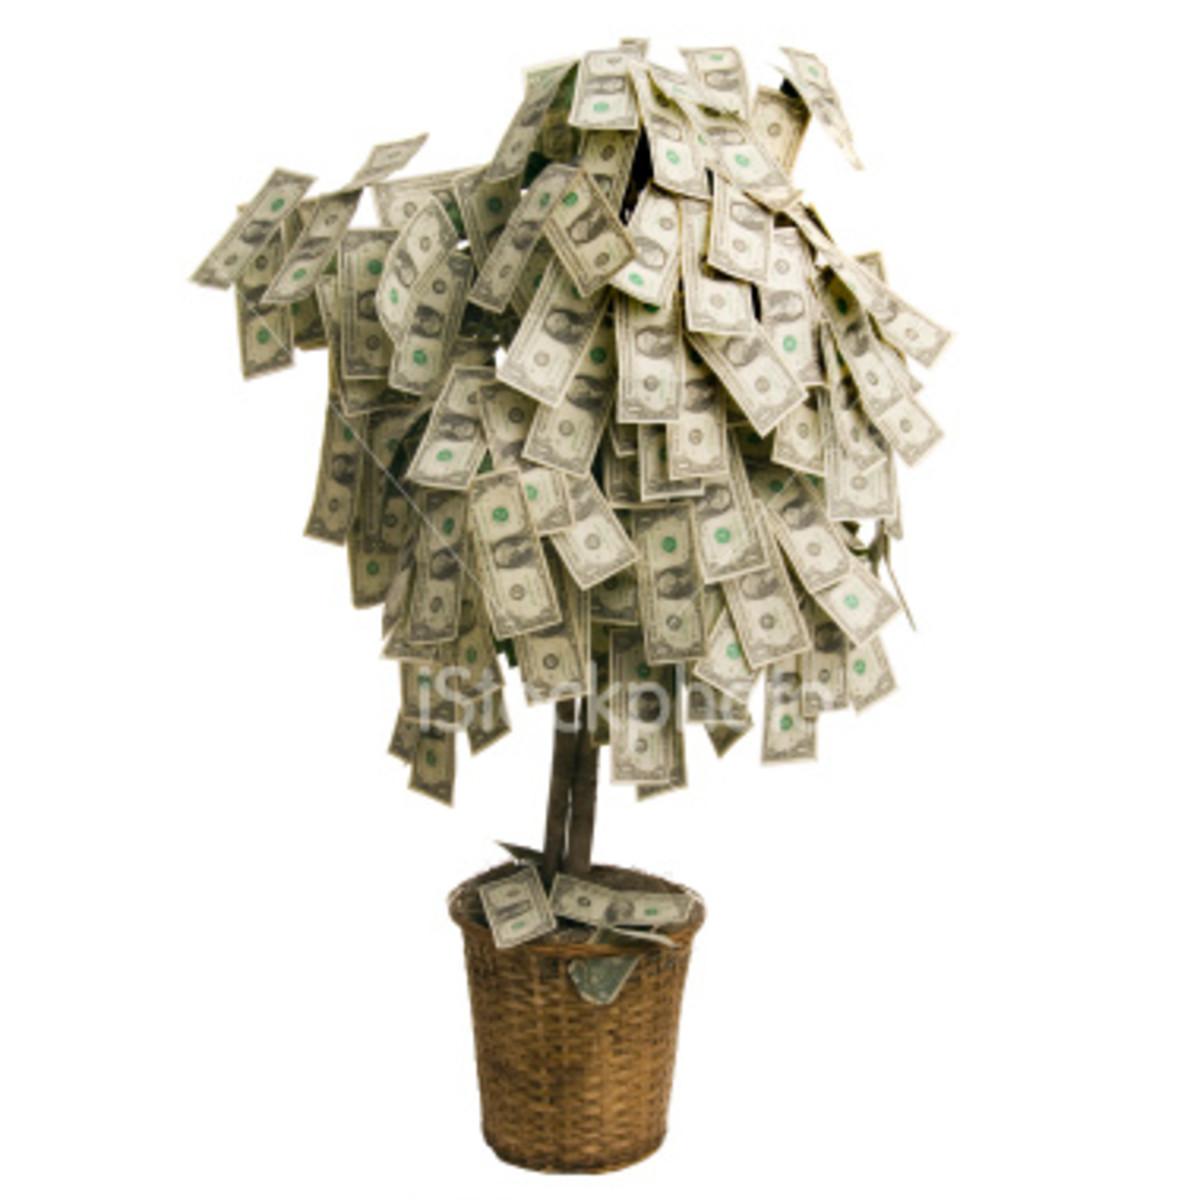 2012 prophecies = money trees. Trust me on this.